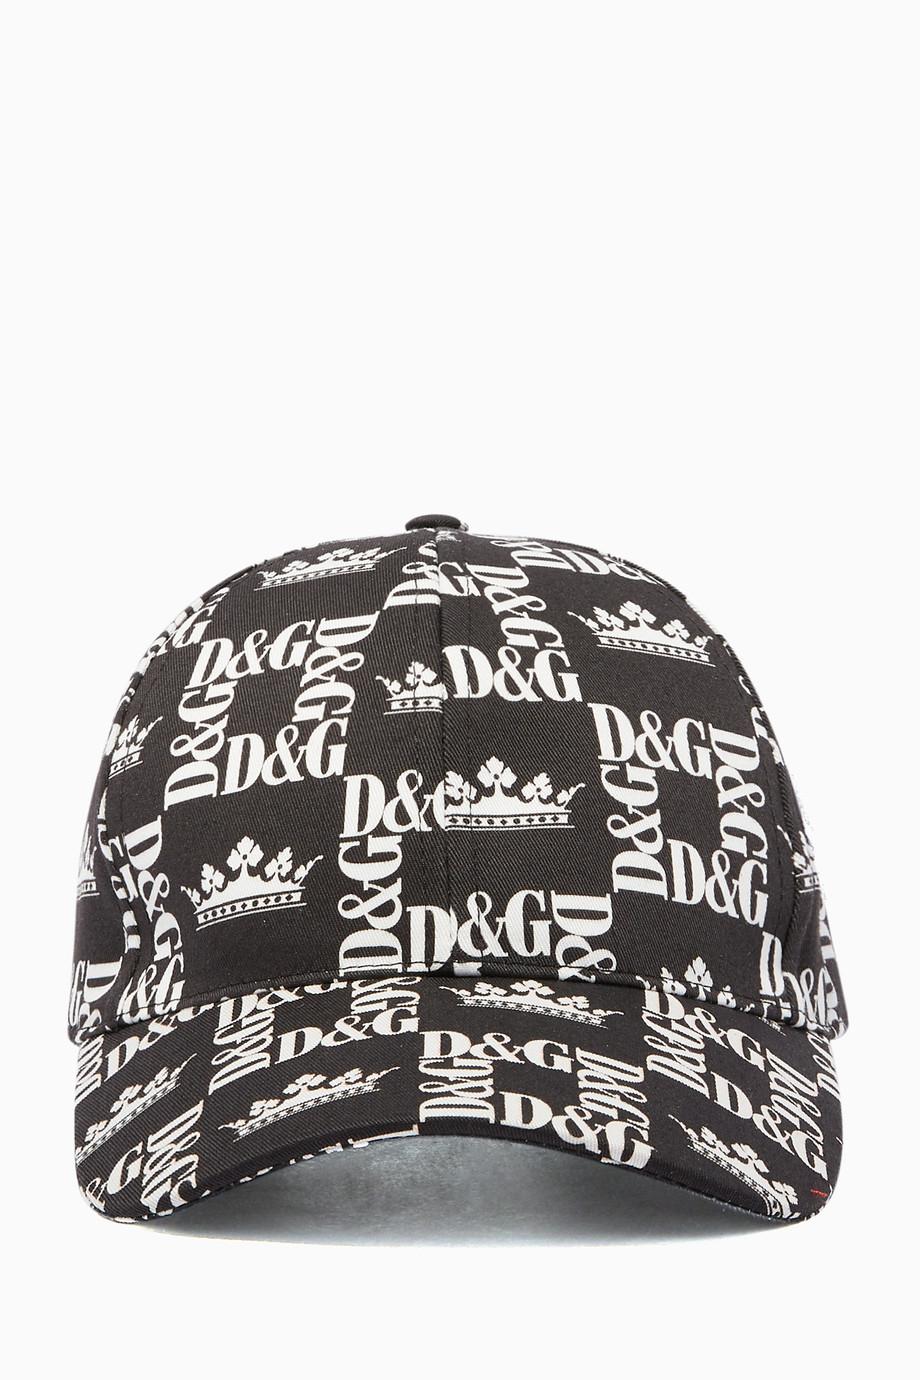 6c30ed5f5 Shop Dolce & Gabbana Black DG Crown Logo Baseball Cap for Men ...